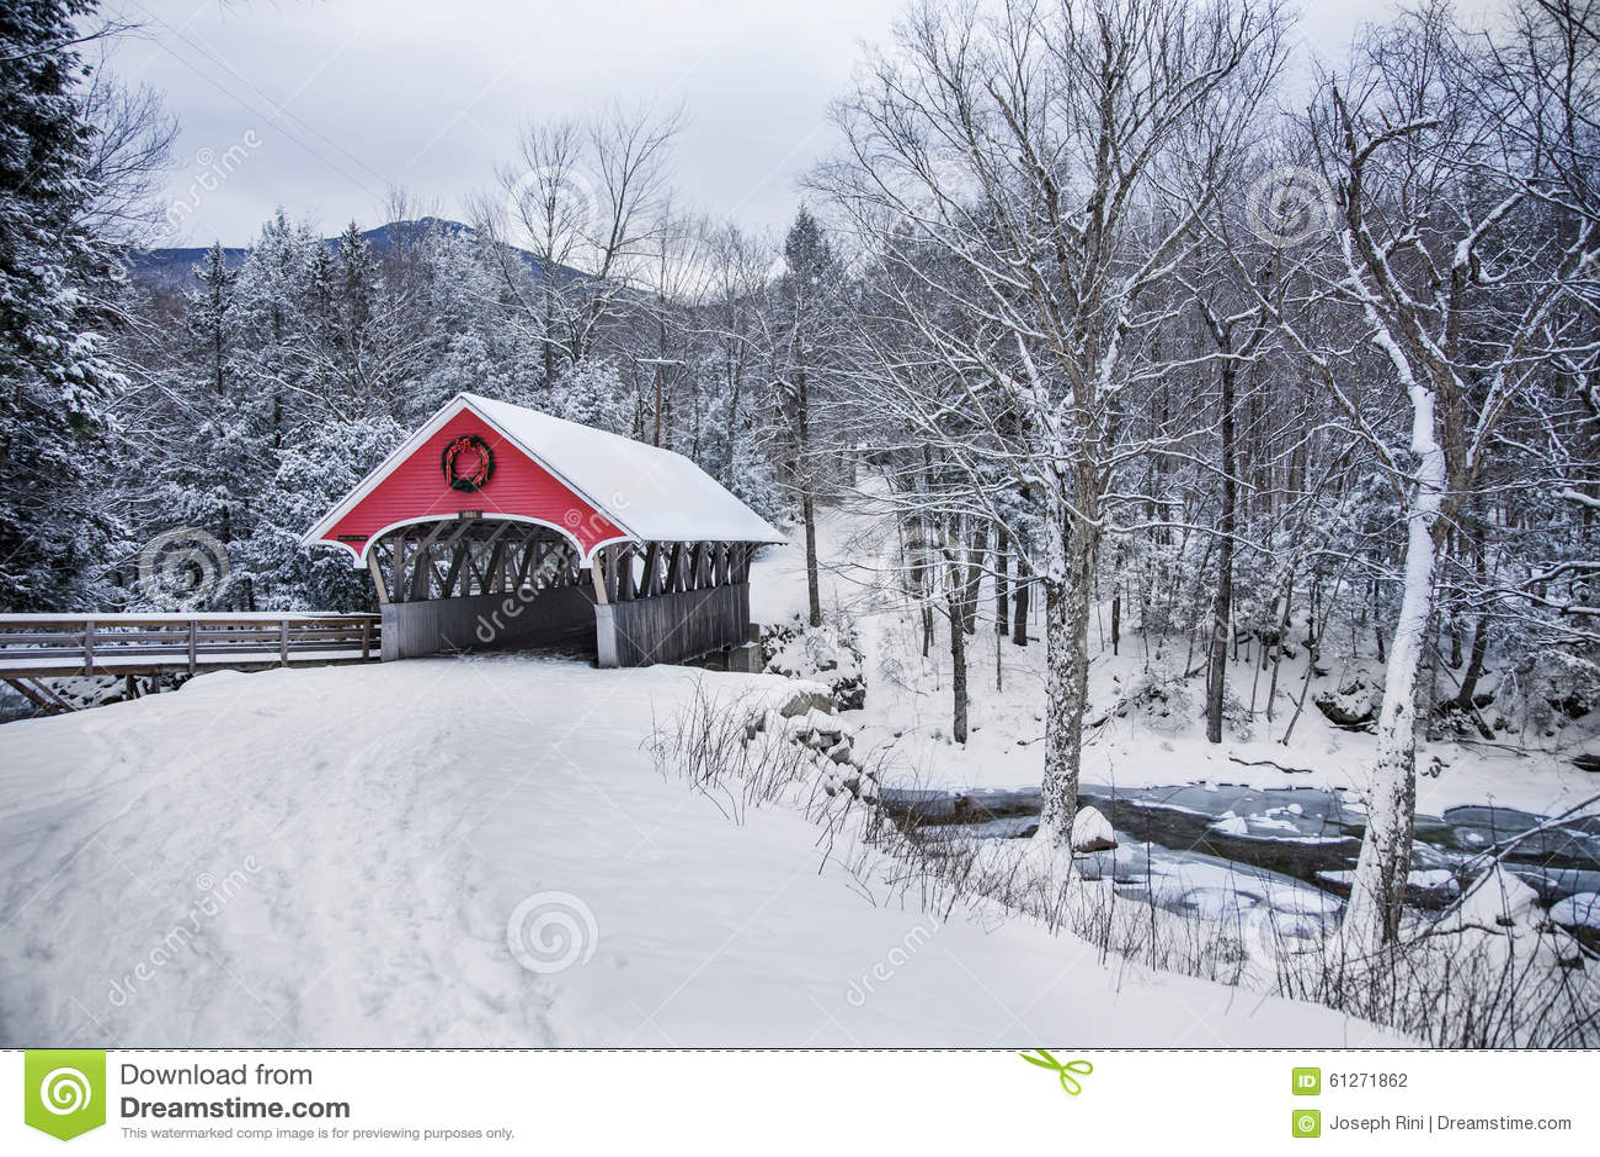 Covered Bridge Snowfall In Rural New Hampshire Stock Photo